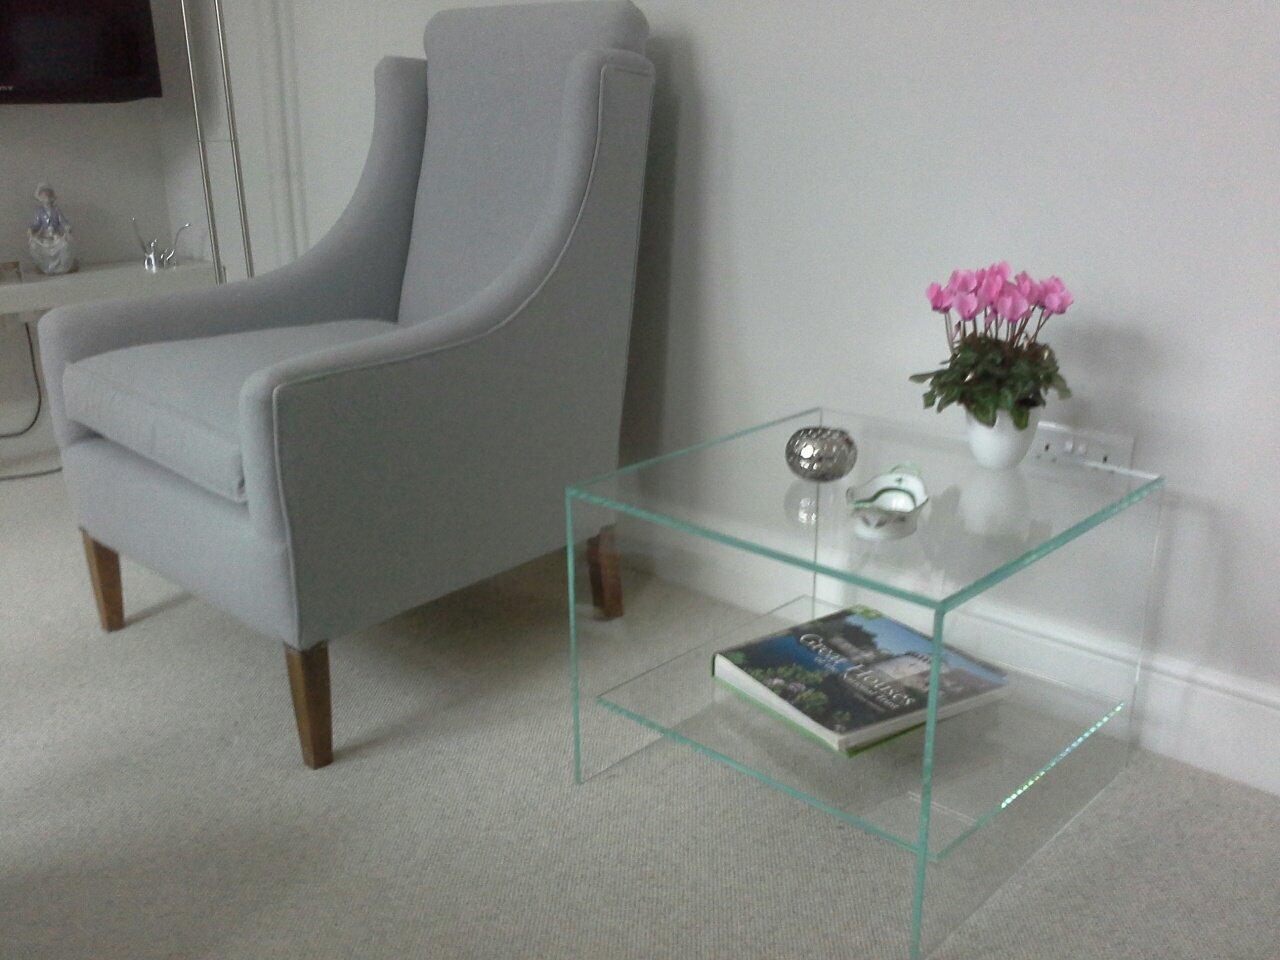 Judd glass side table